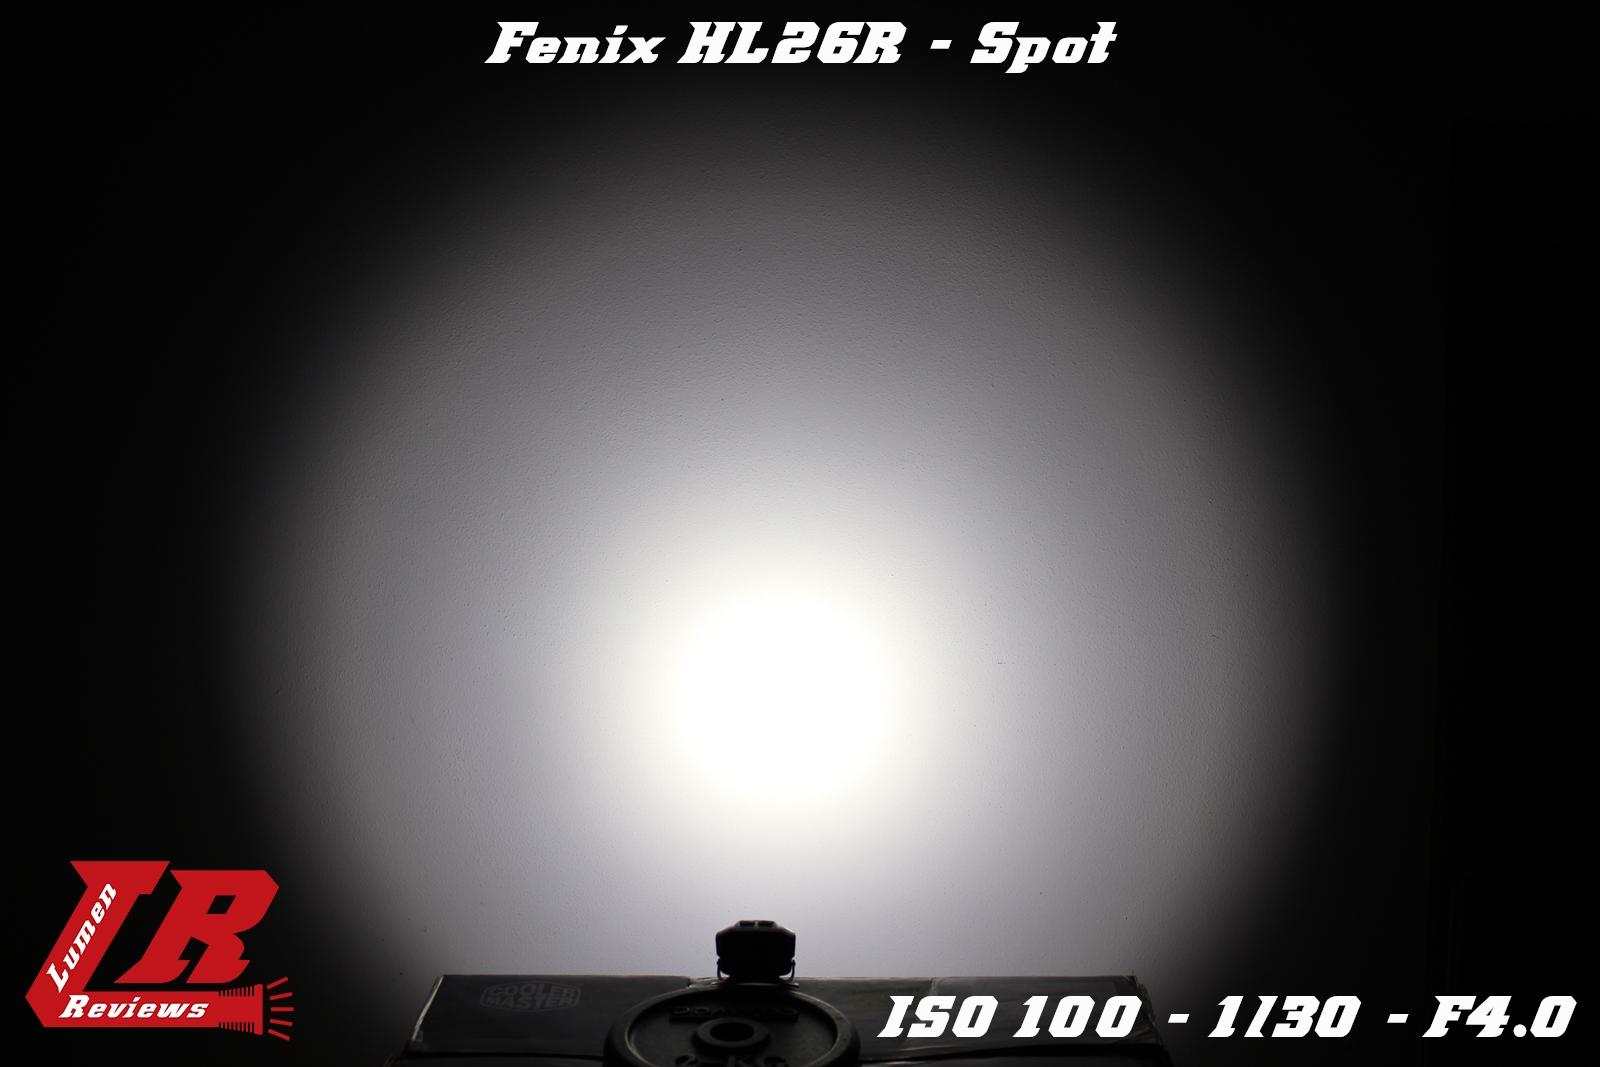 Fenix HL26R 17